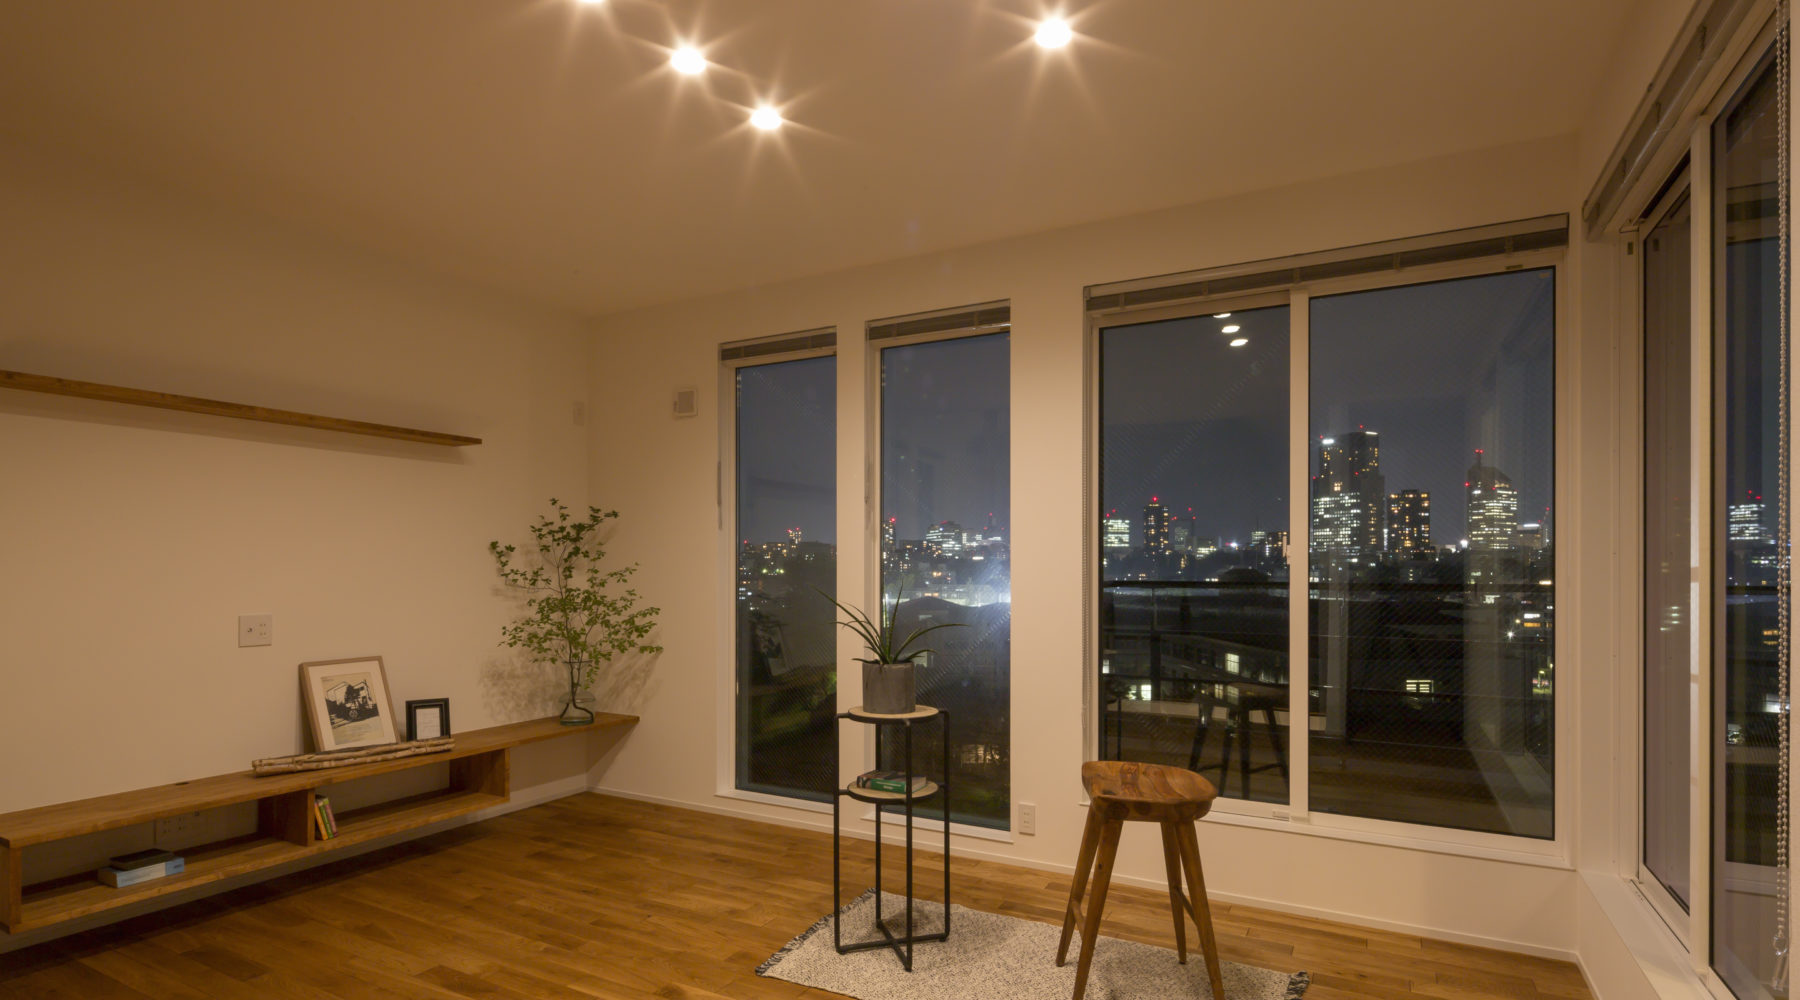 株式会社 建舎団居 STUDIO MADOI 向山の家 2020/8 竣工